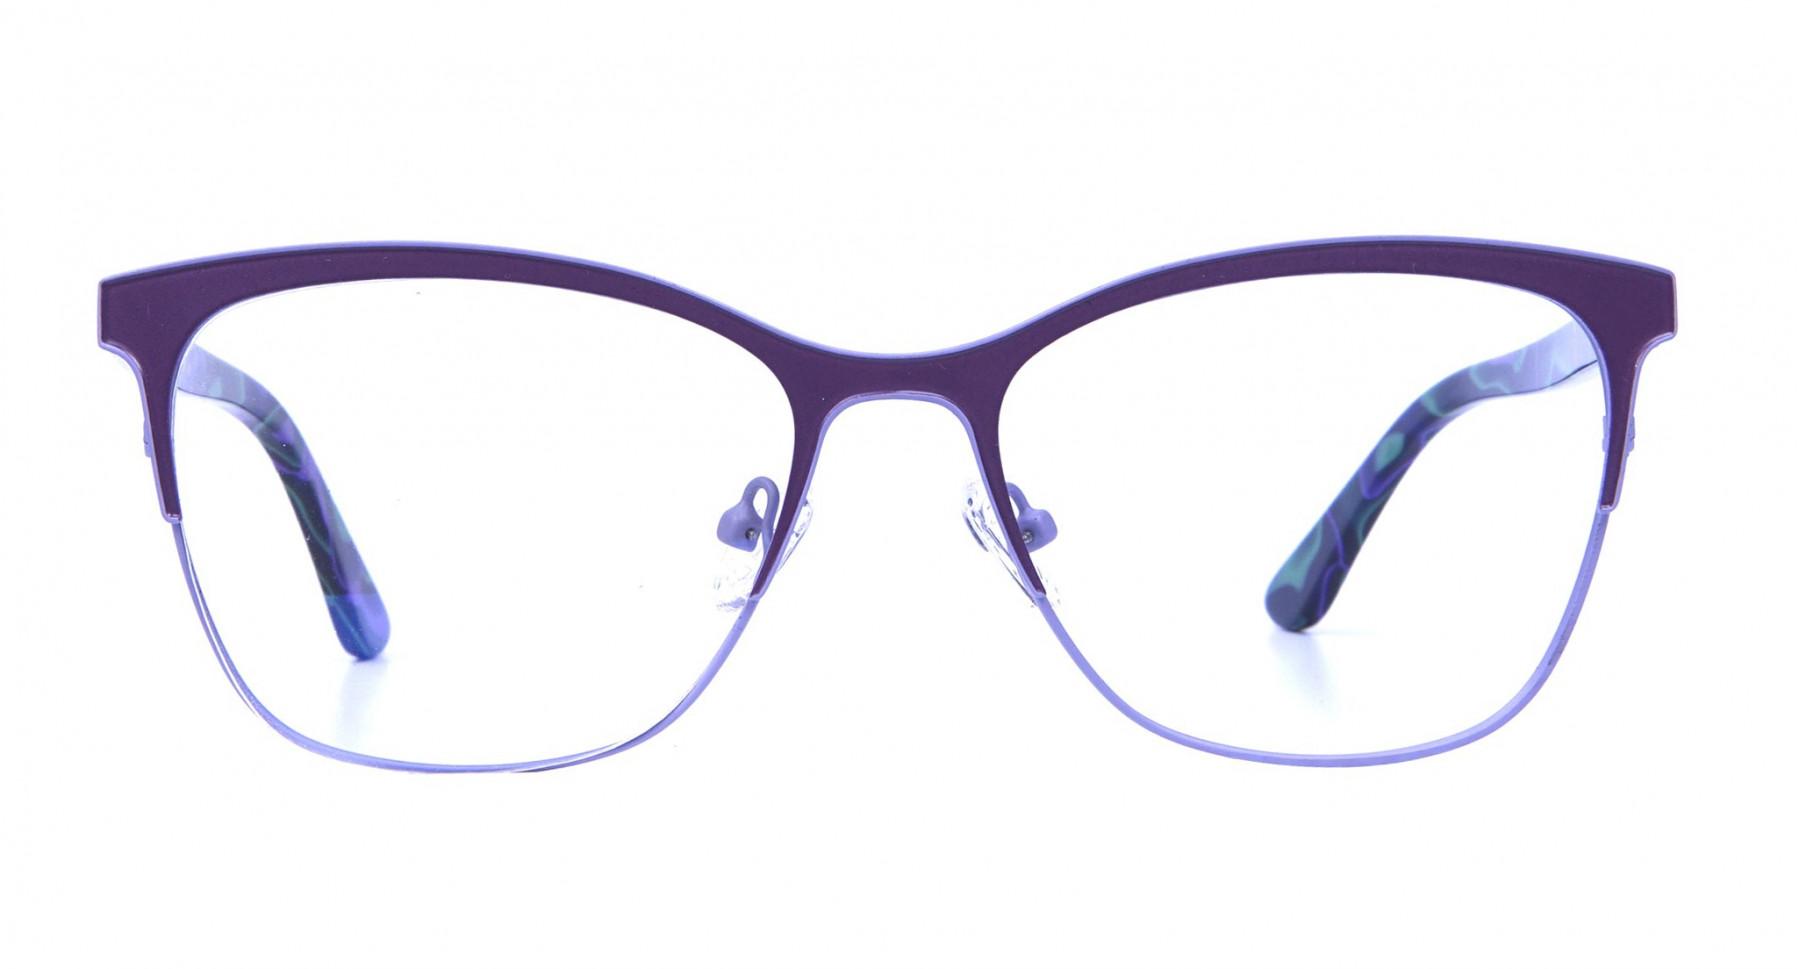 Violet & Aurora Green Dual Tone Glasses